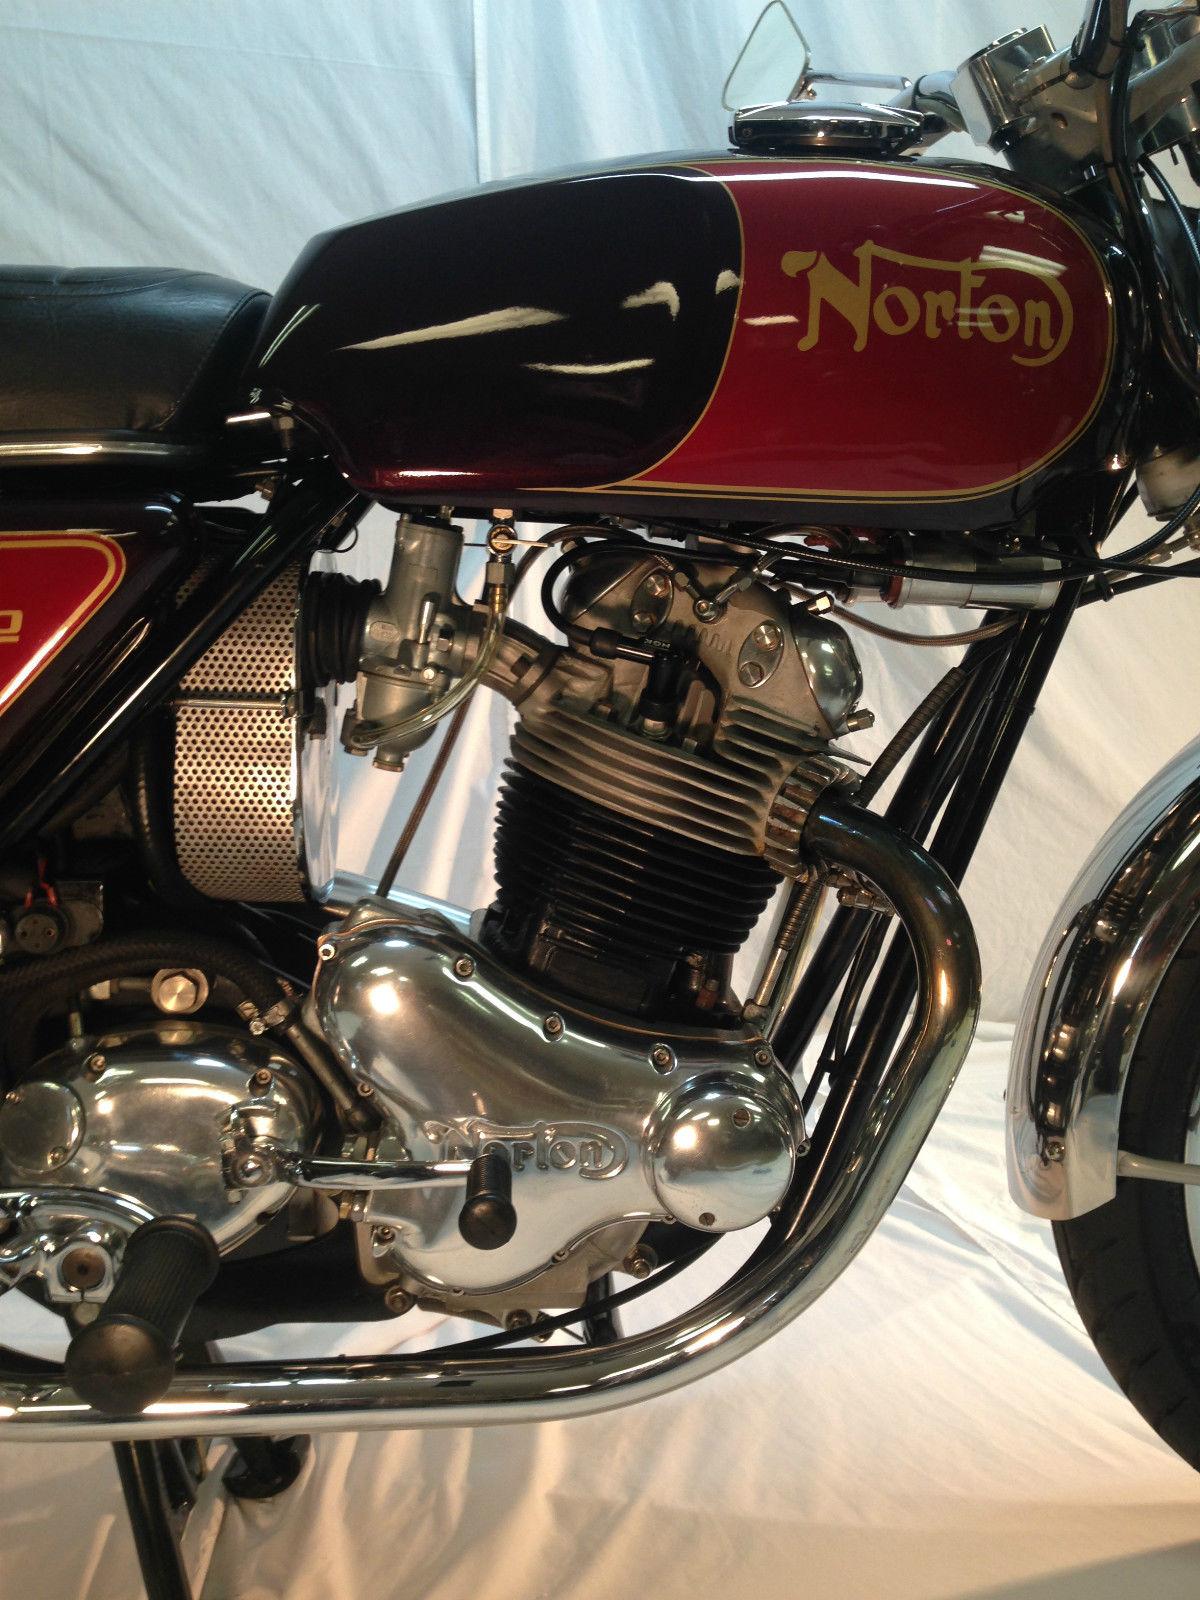 Norton Commando 850 - 1973